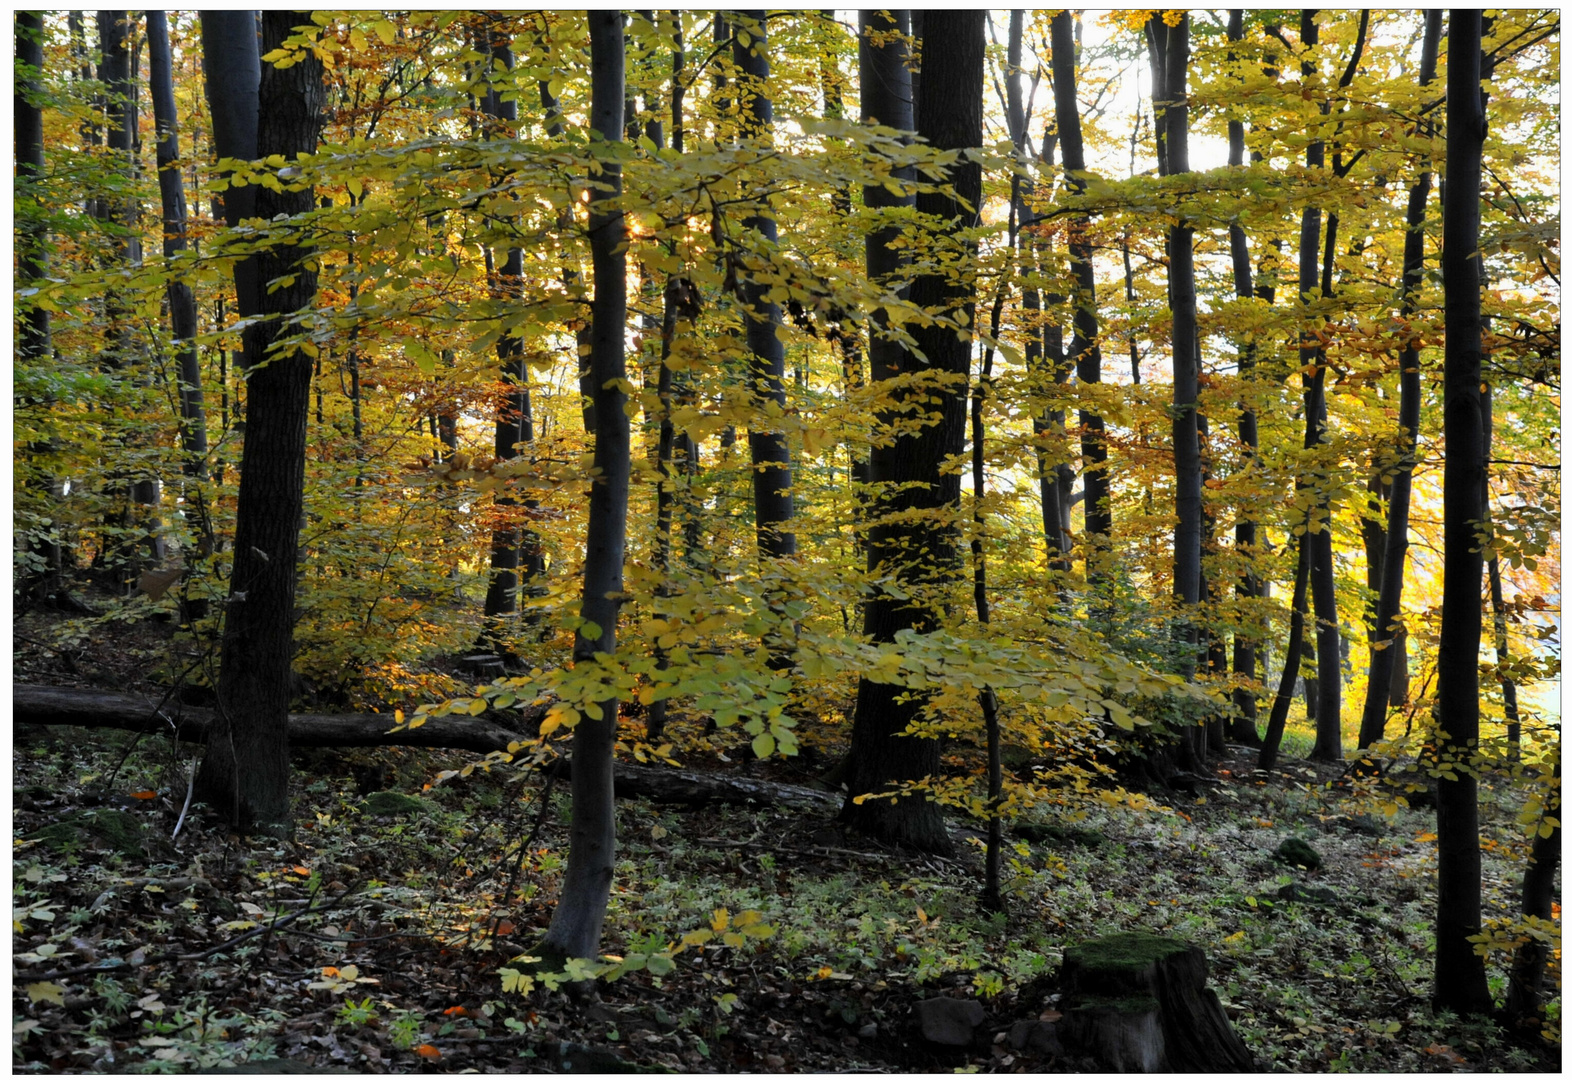 Bosque en otoño IV (Wald im Herbst IV)